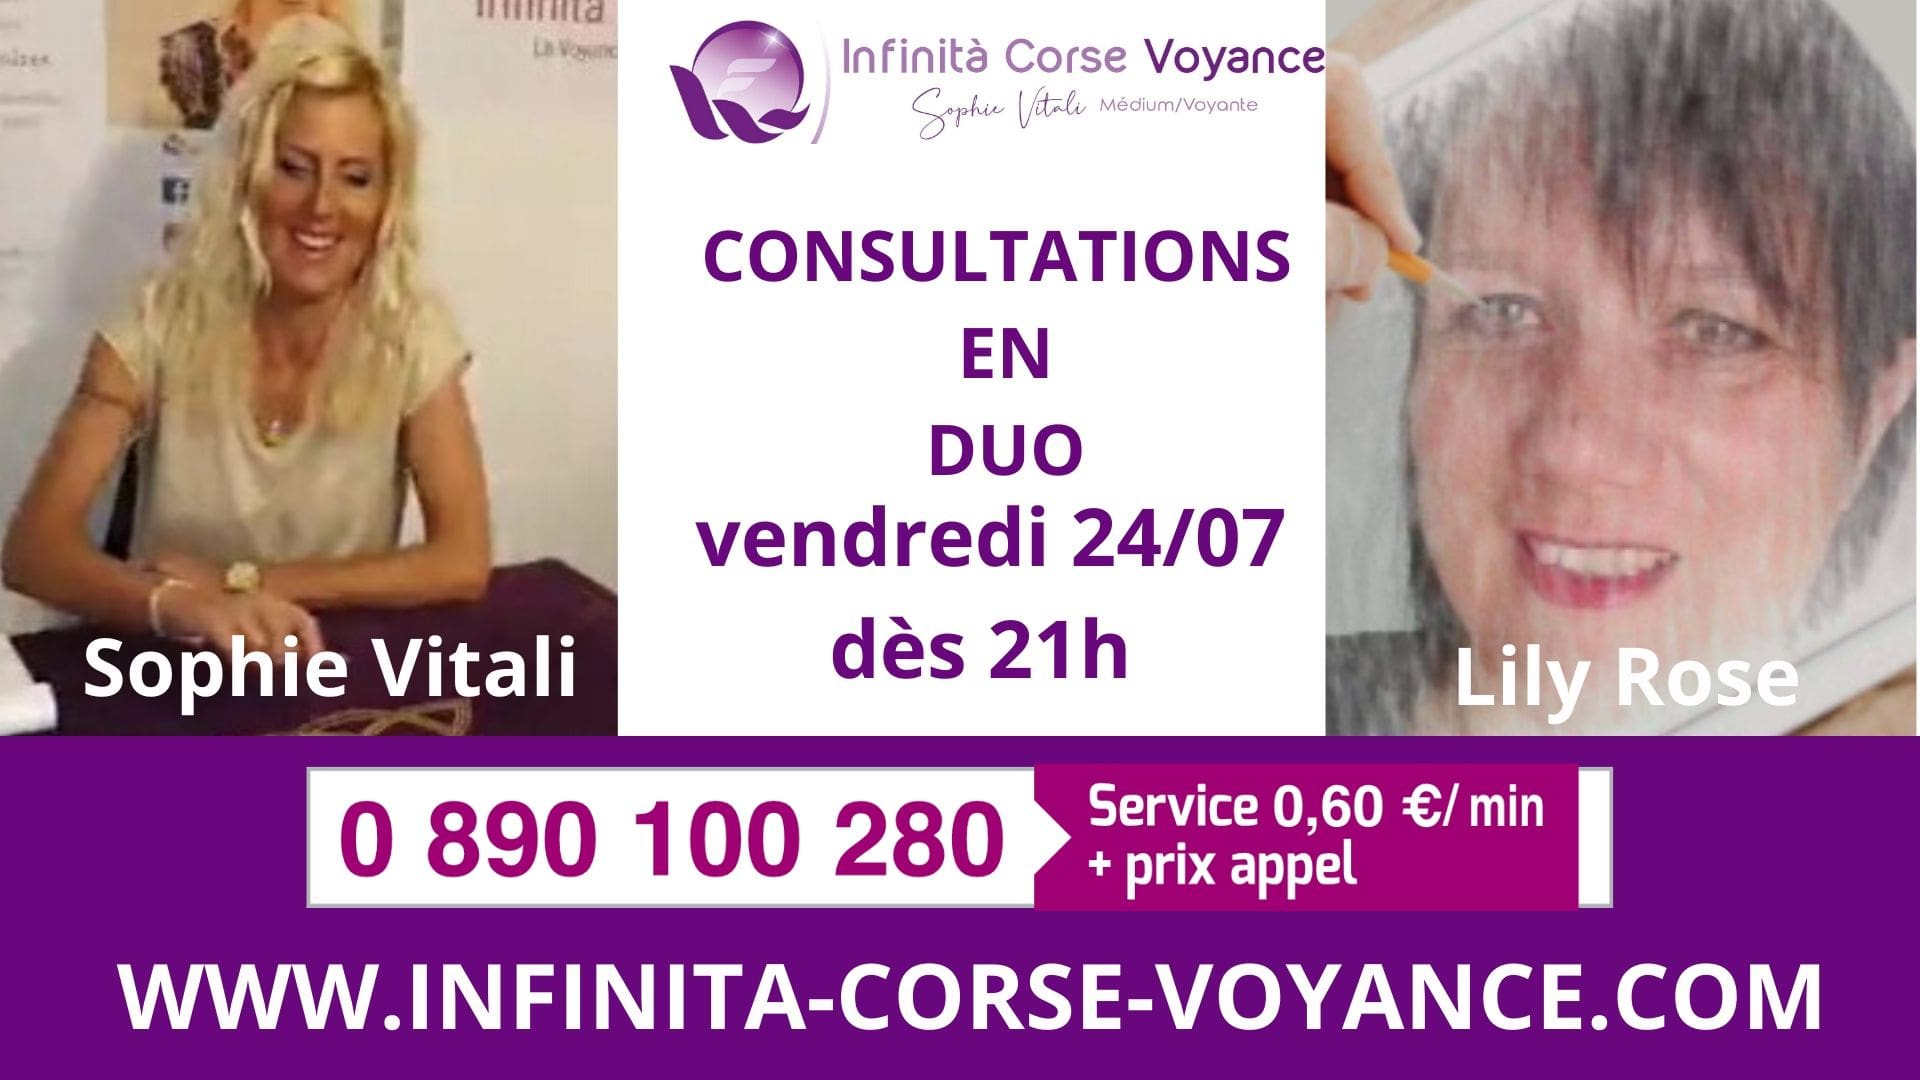 Consultation duo Sophie Vitali & Lily Rose / Infinità Corse Voyance